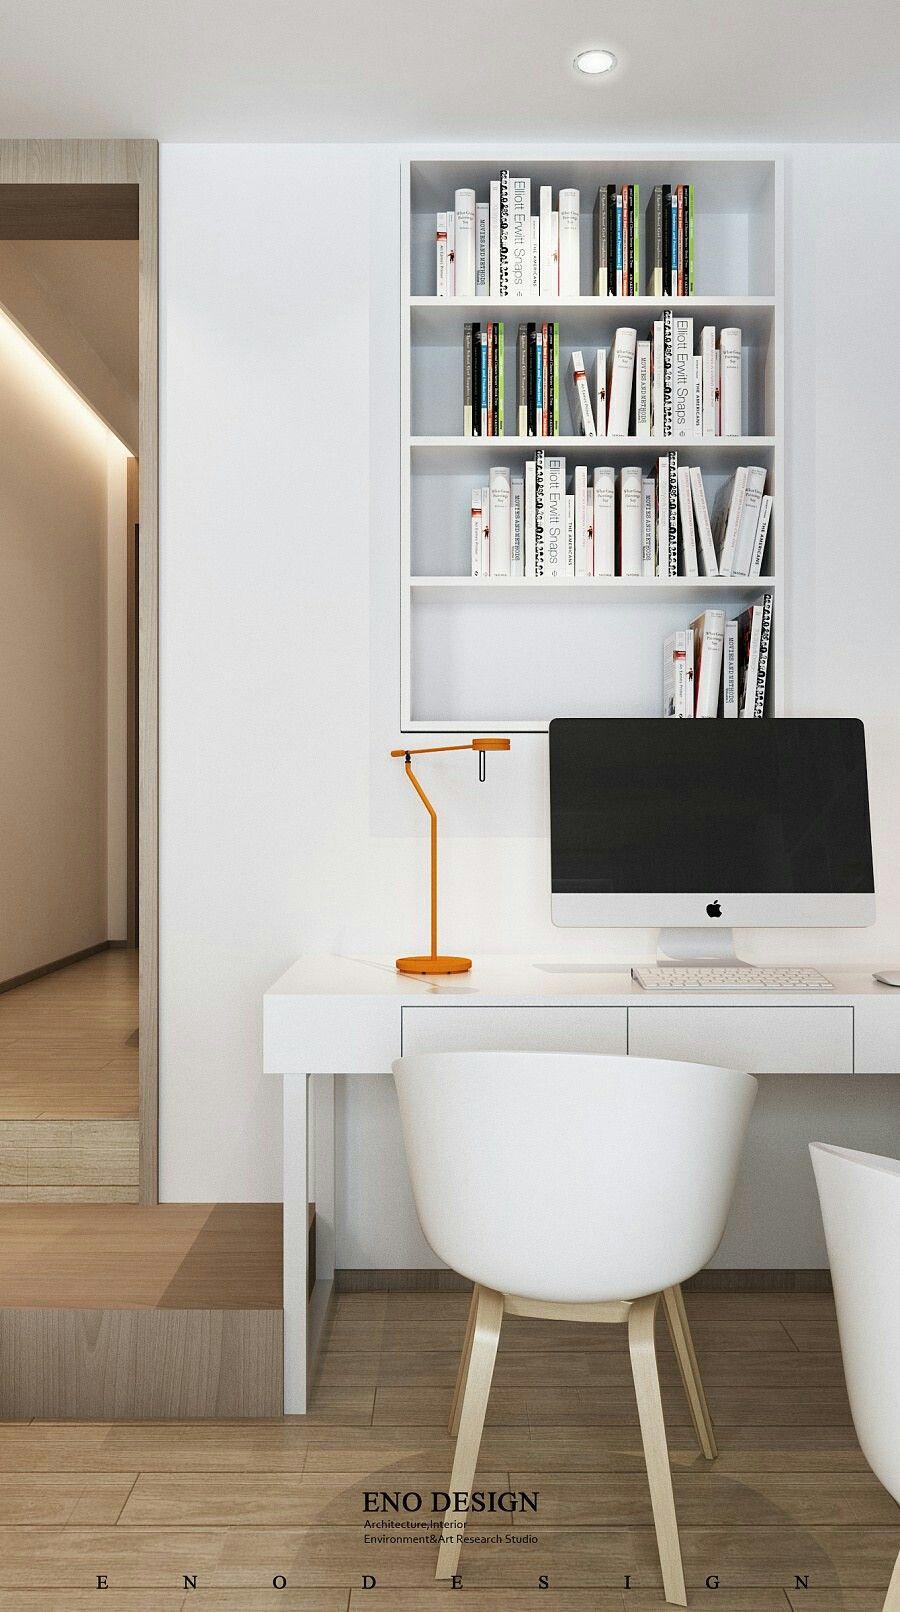 Minimalist Home Office Idea / By ENO DESIGN #homeoffice #bureau #idée  #interieur